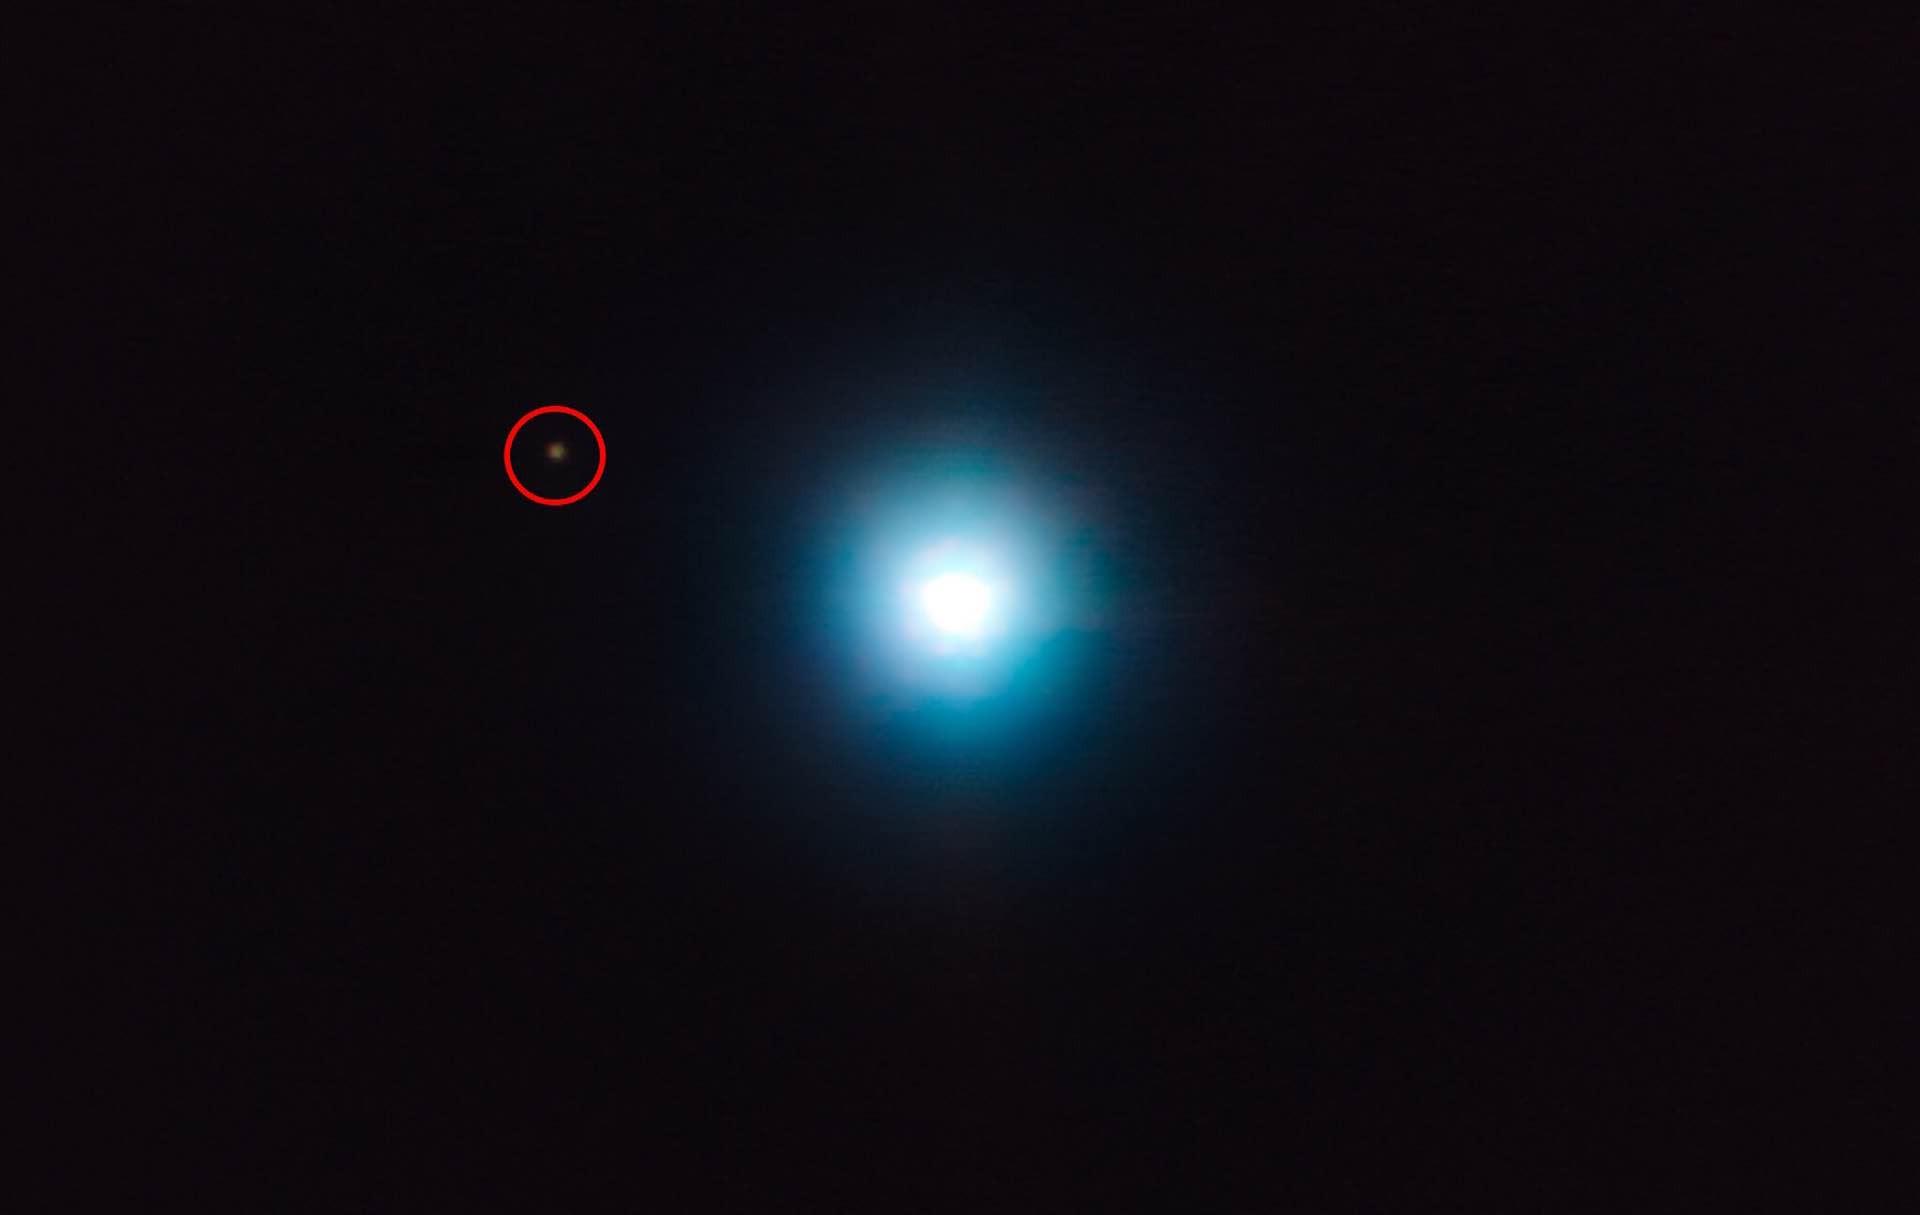 Photo: ESO/Schmidt et al.